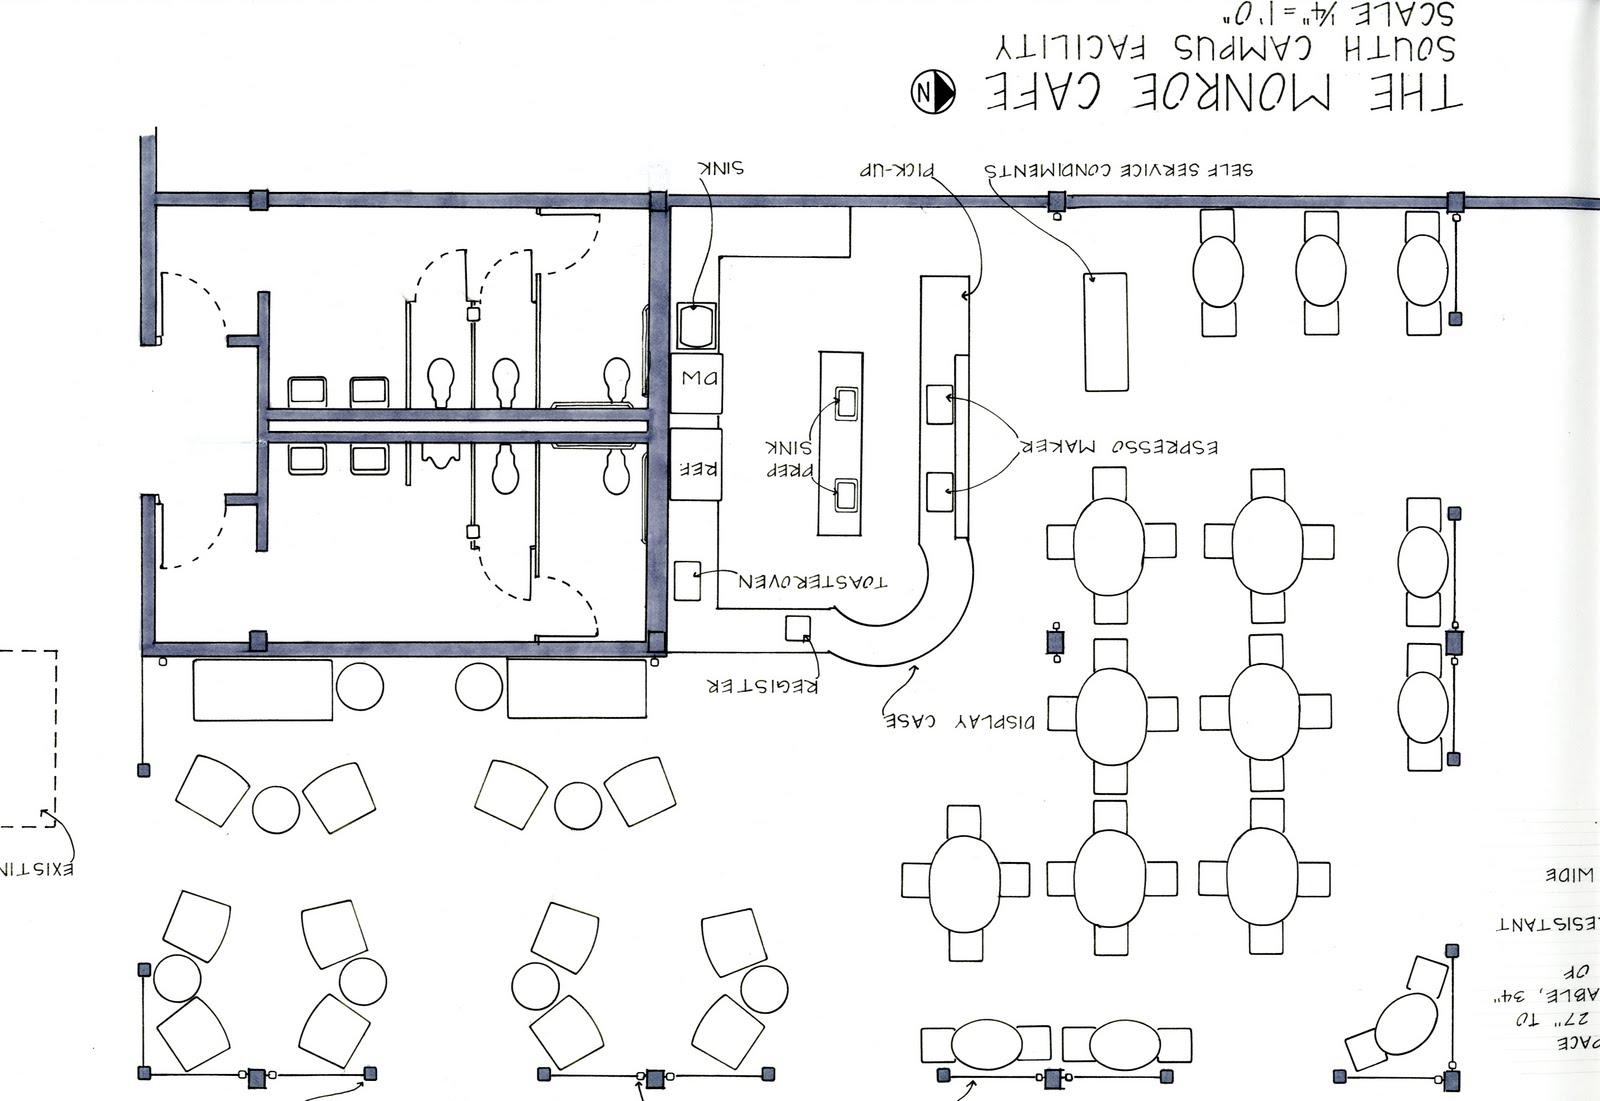 Shannon stewart the monroe cafe for Cafe floor plan design